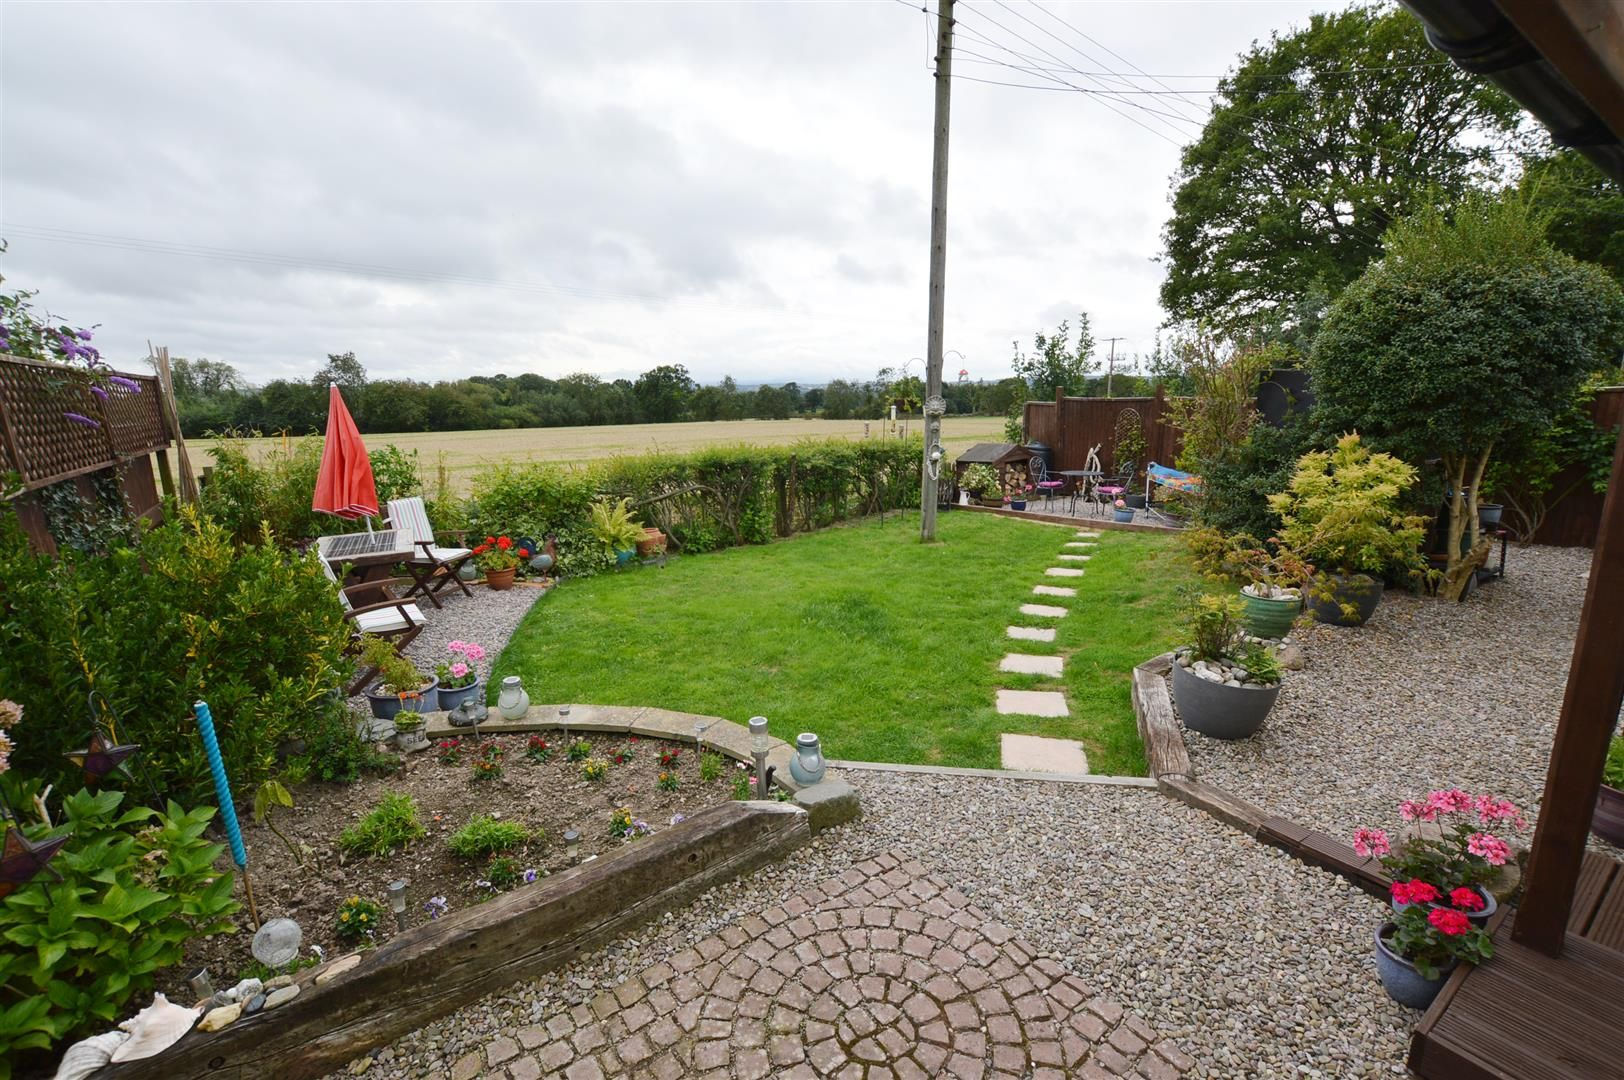 3 bed semi-detached-bungalow for sale in Shobdon 8